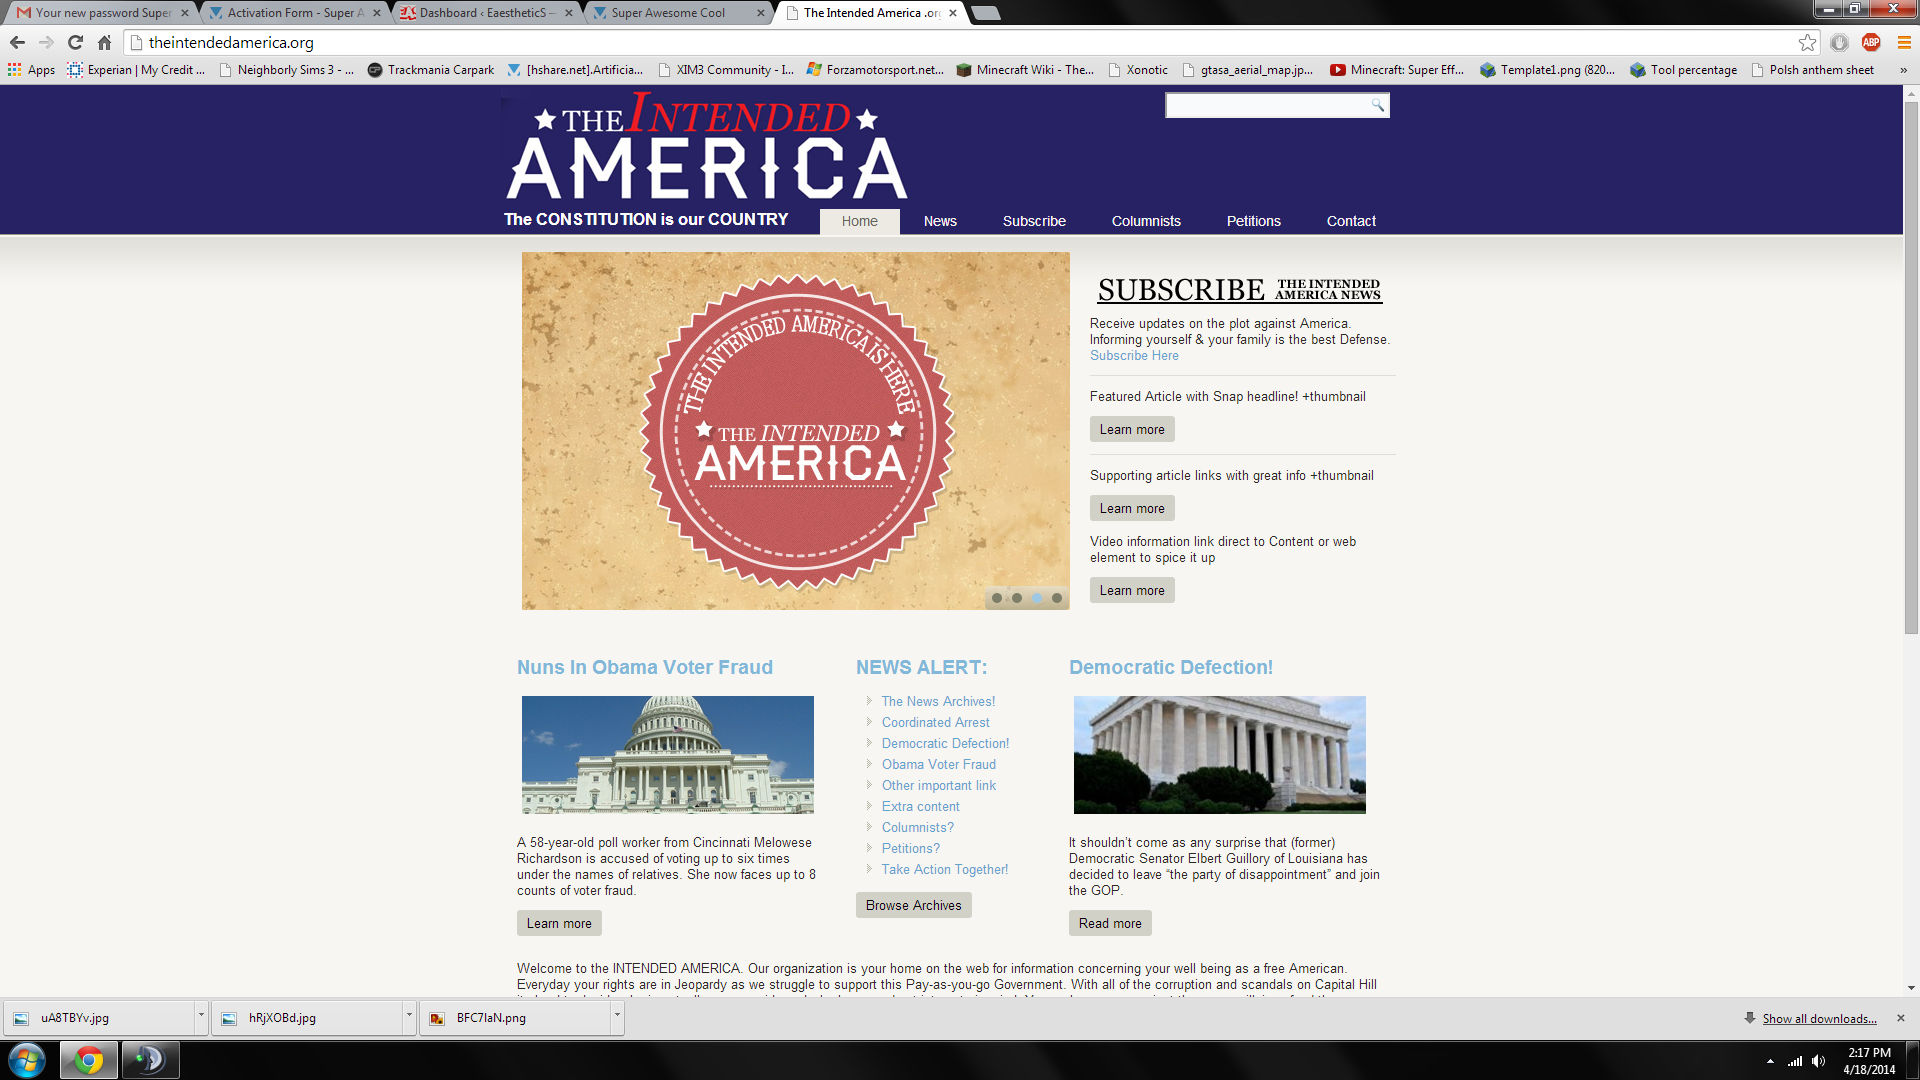 TheIntendedAmerica